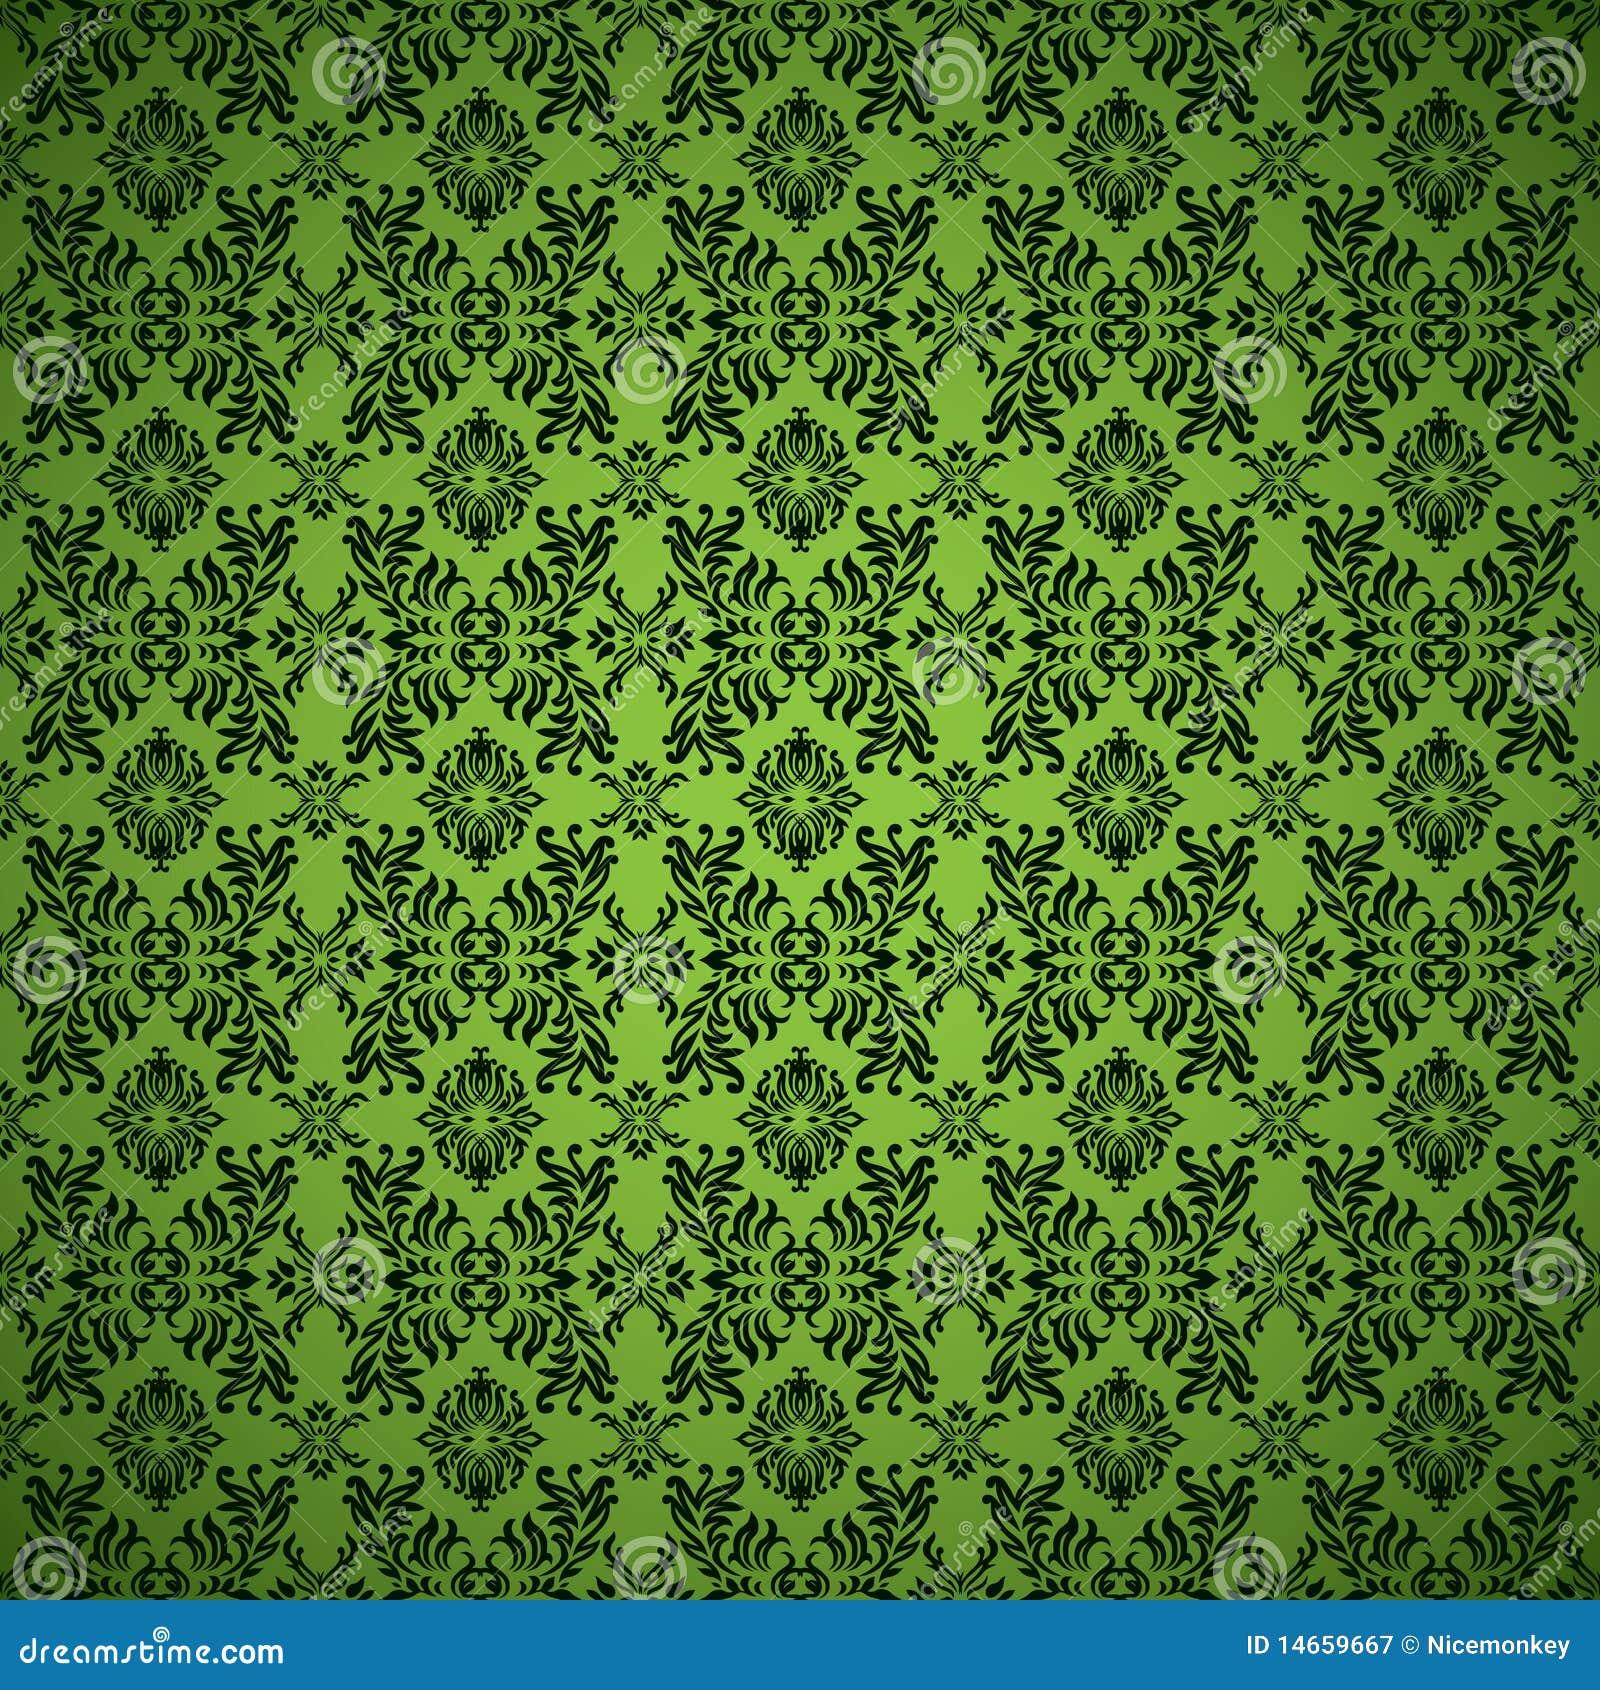 Gothic Seamless Green Wallpaper Stock Vector Illustration Of Green